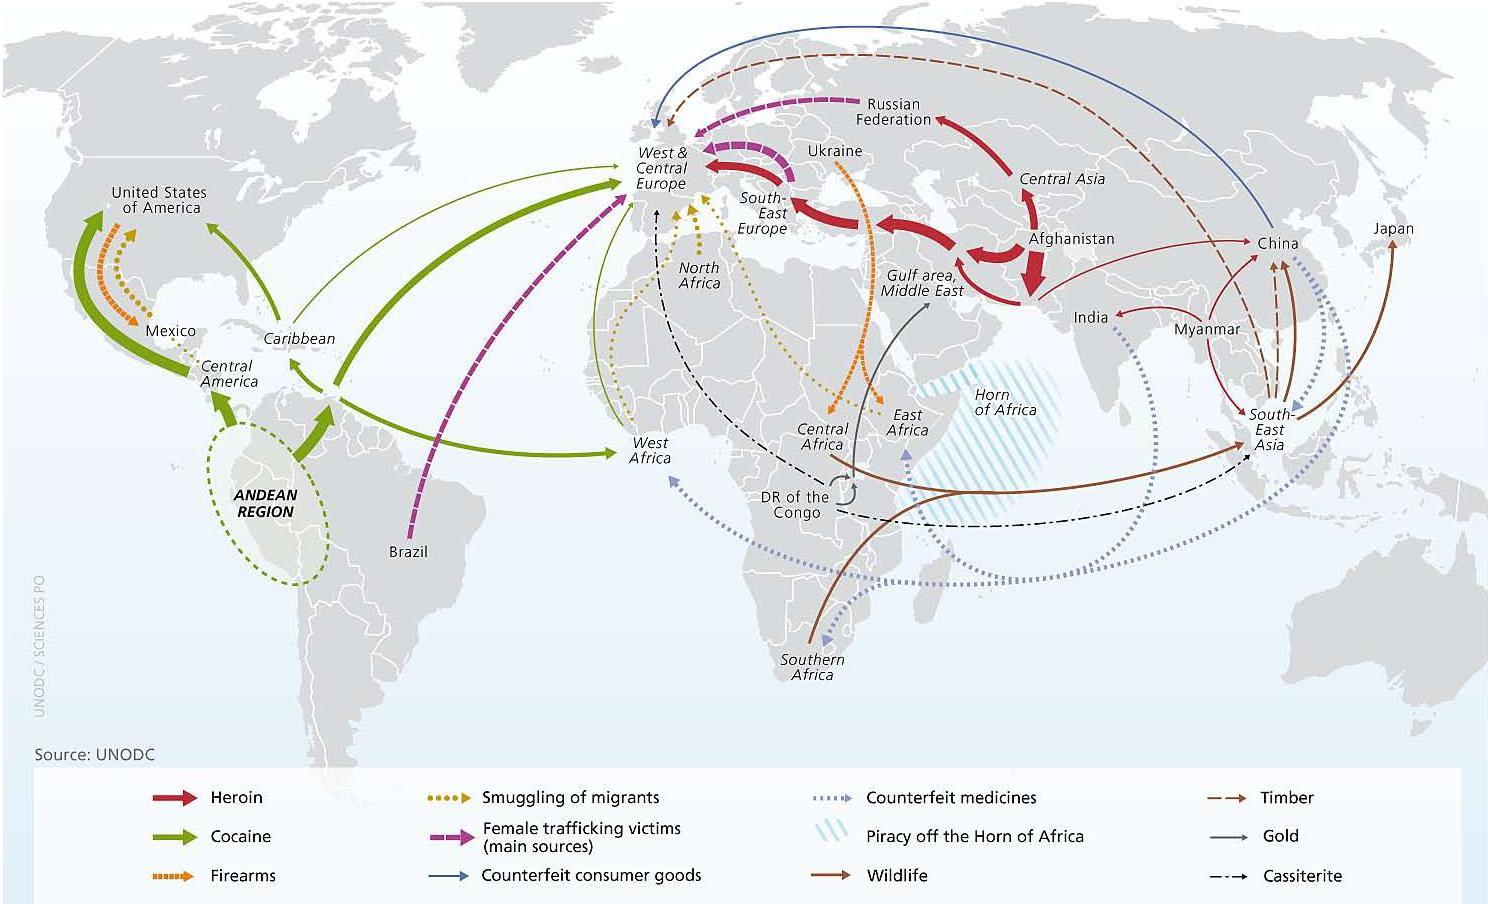 UNODC drug maps